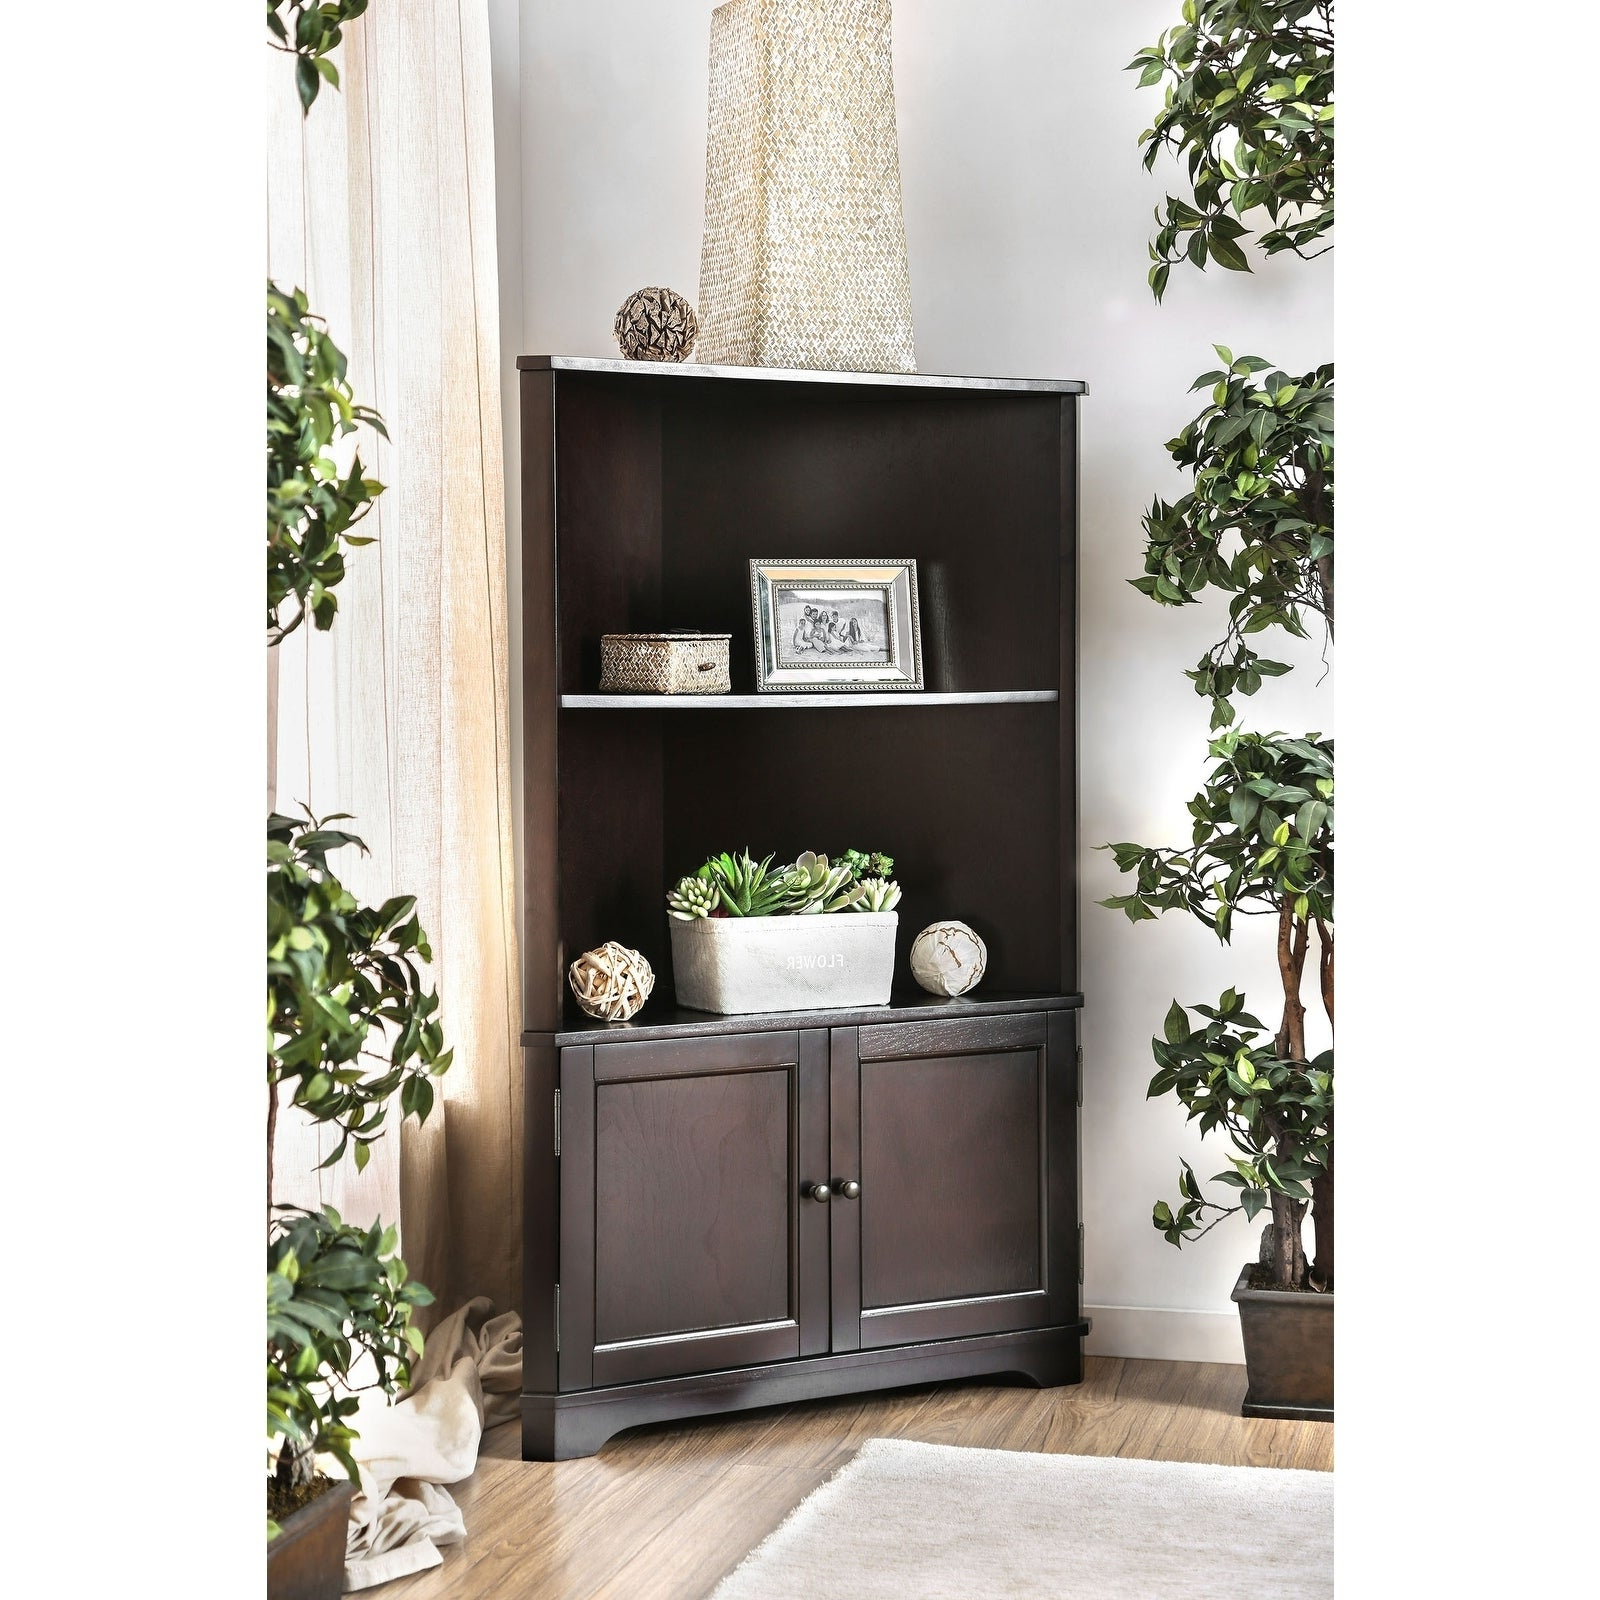 Williams Import Cavan Contemporary Bookshelf In Dark Walnut In Popular Vas Corner Bookcases (View 8 of 20)